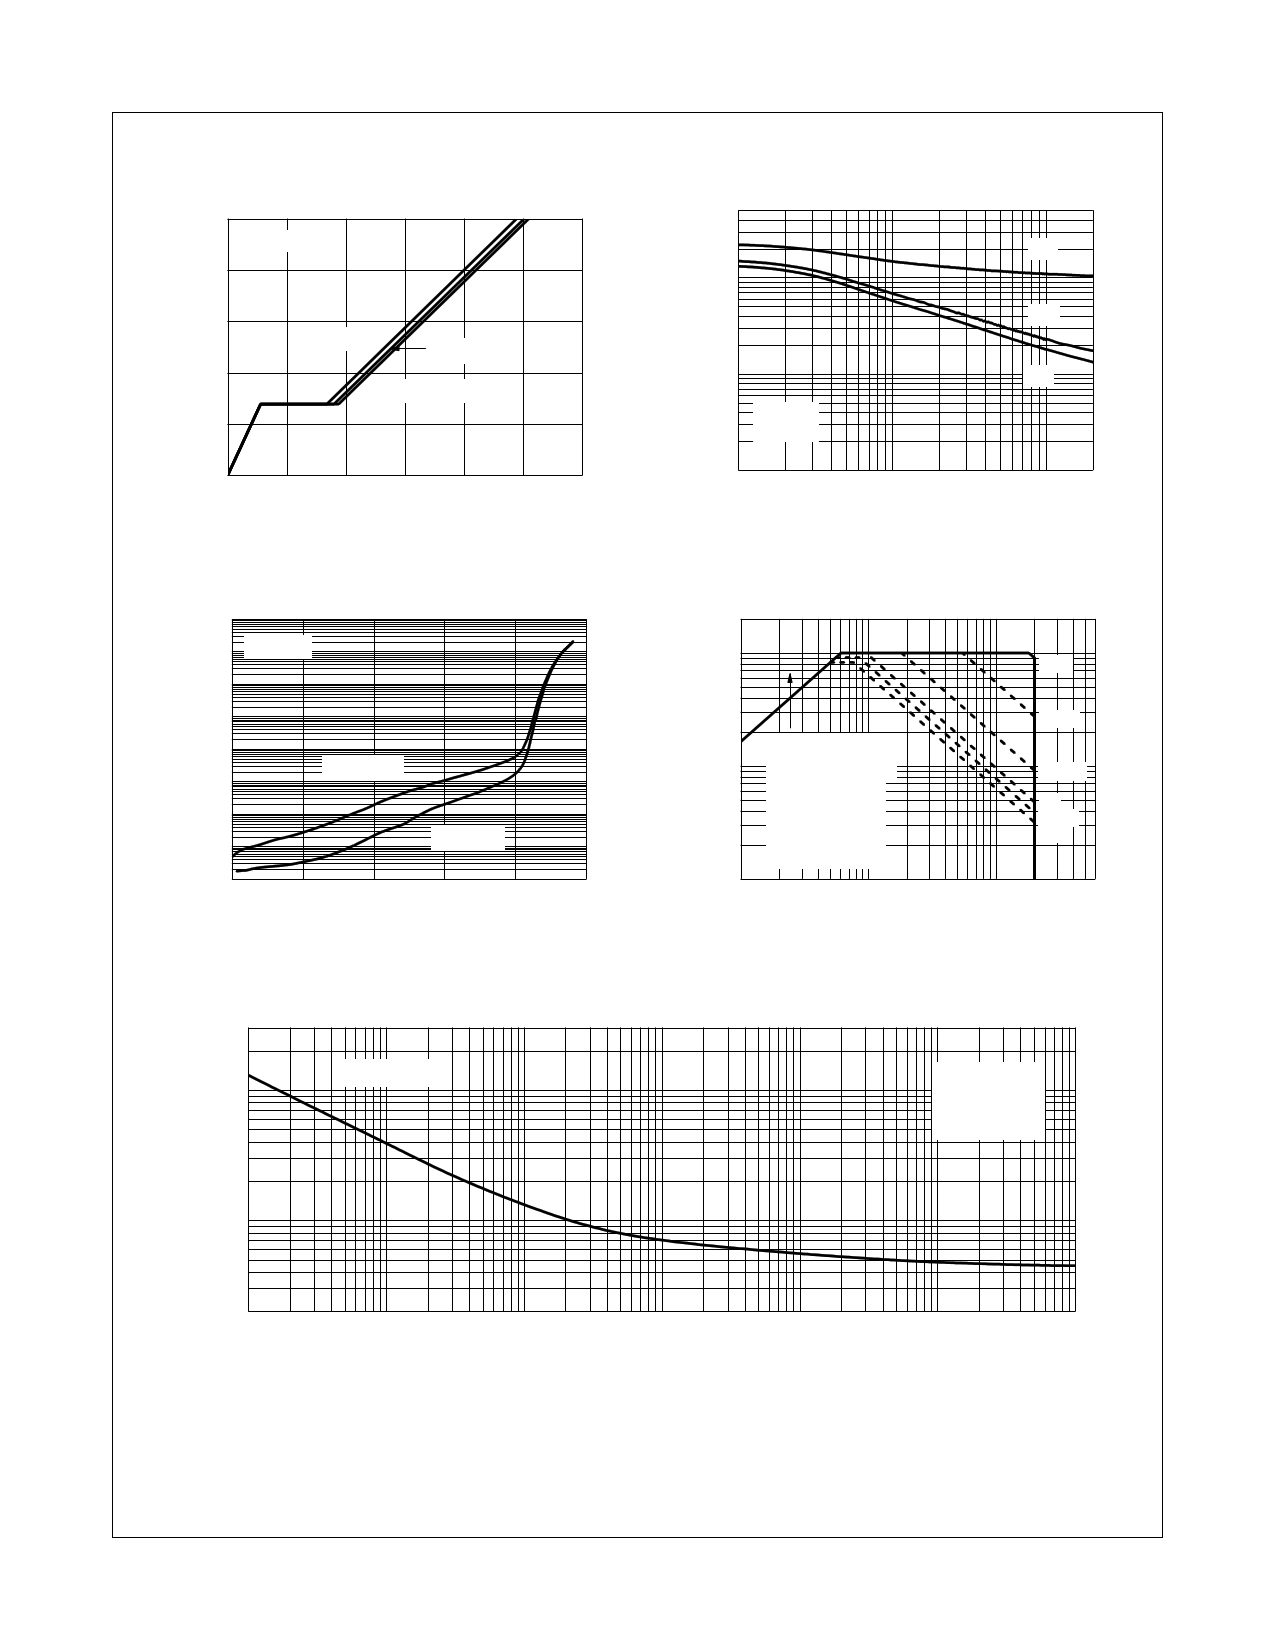 FDY1002PZ pdf, 반도체, 판매, 대치품